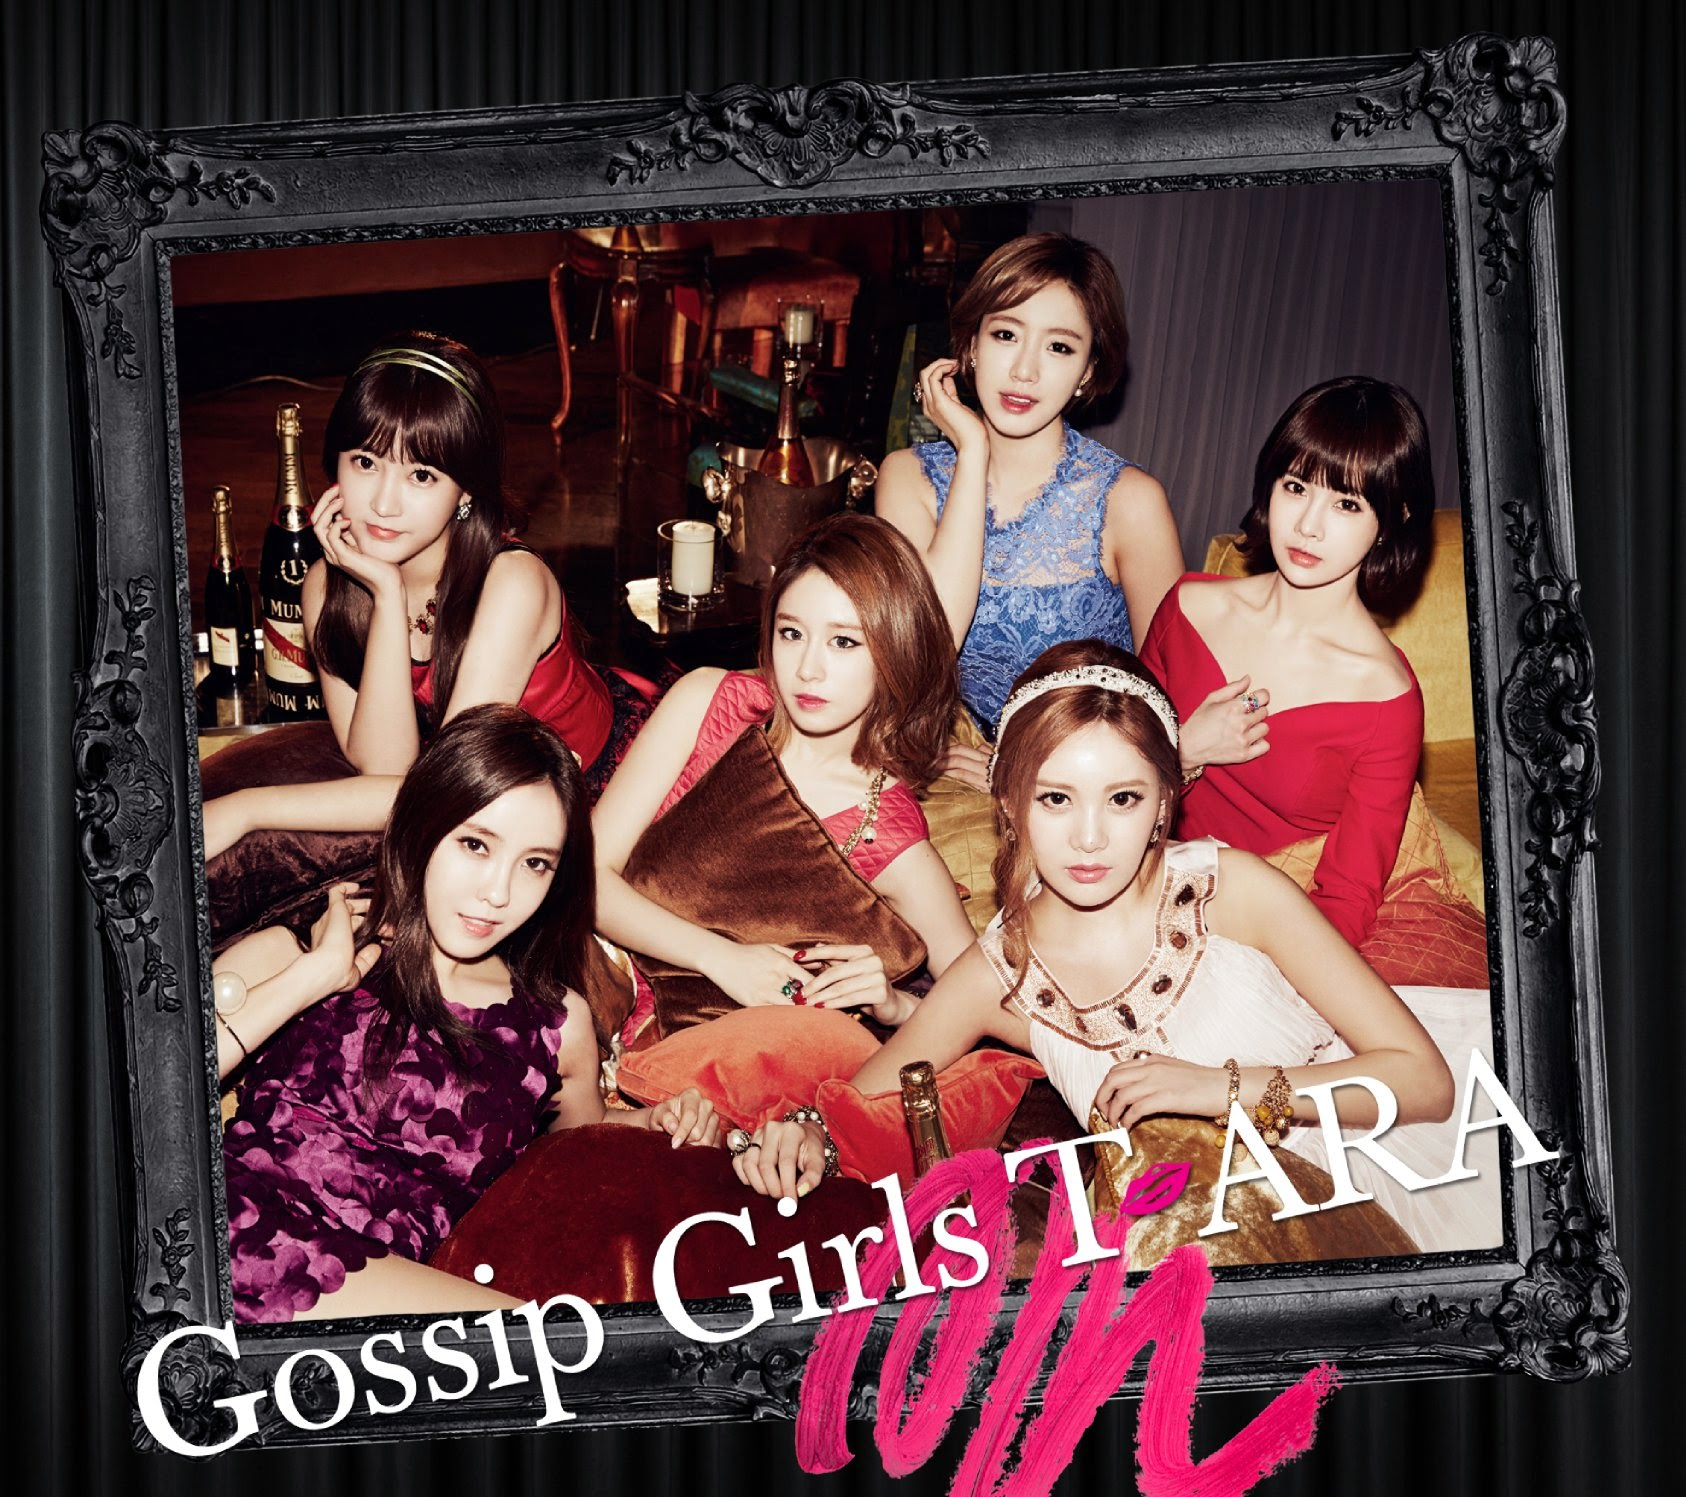 ara gossip girls cover